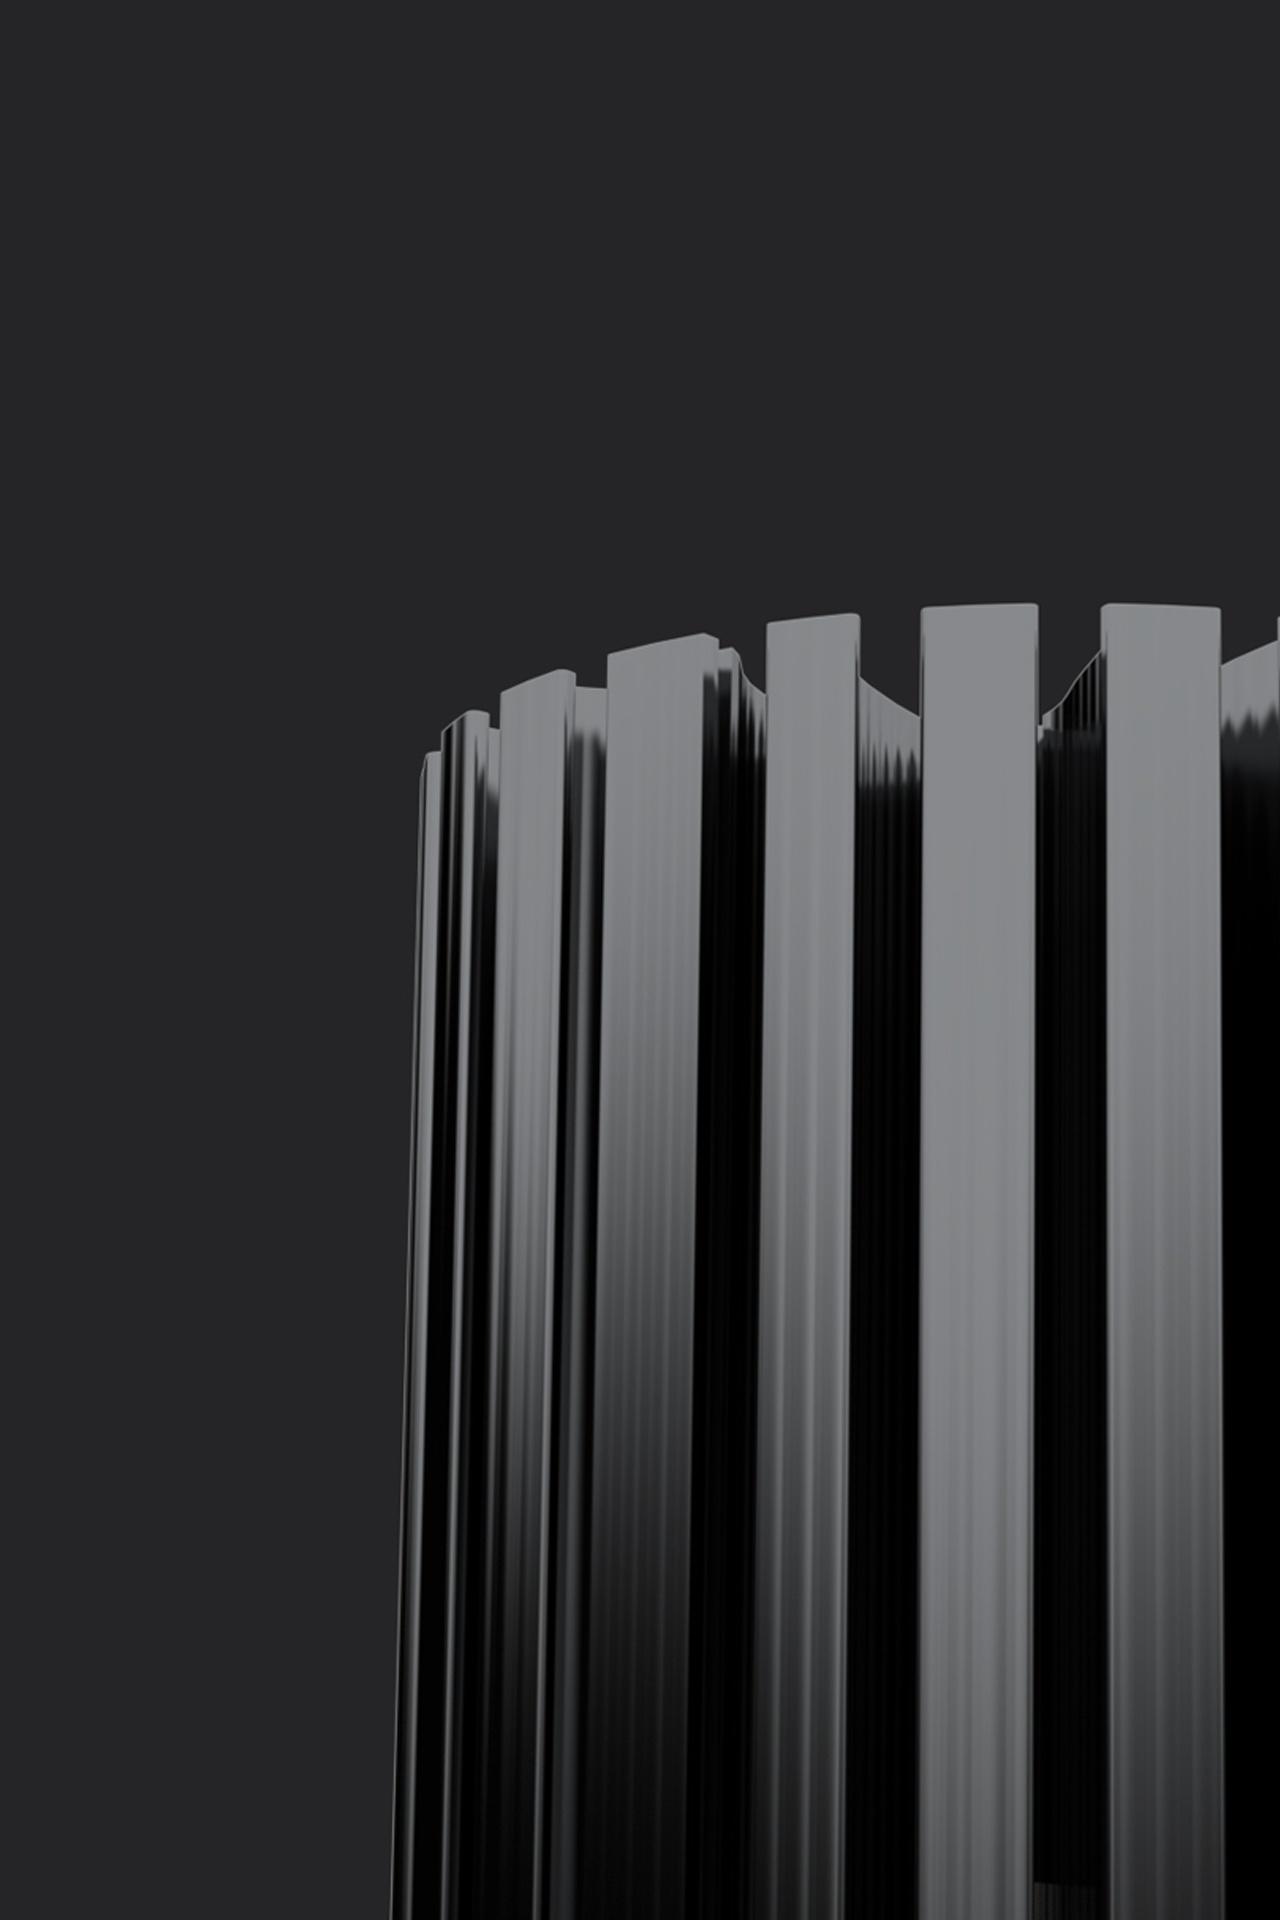 black light on black background